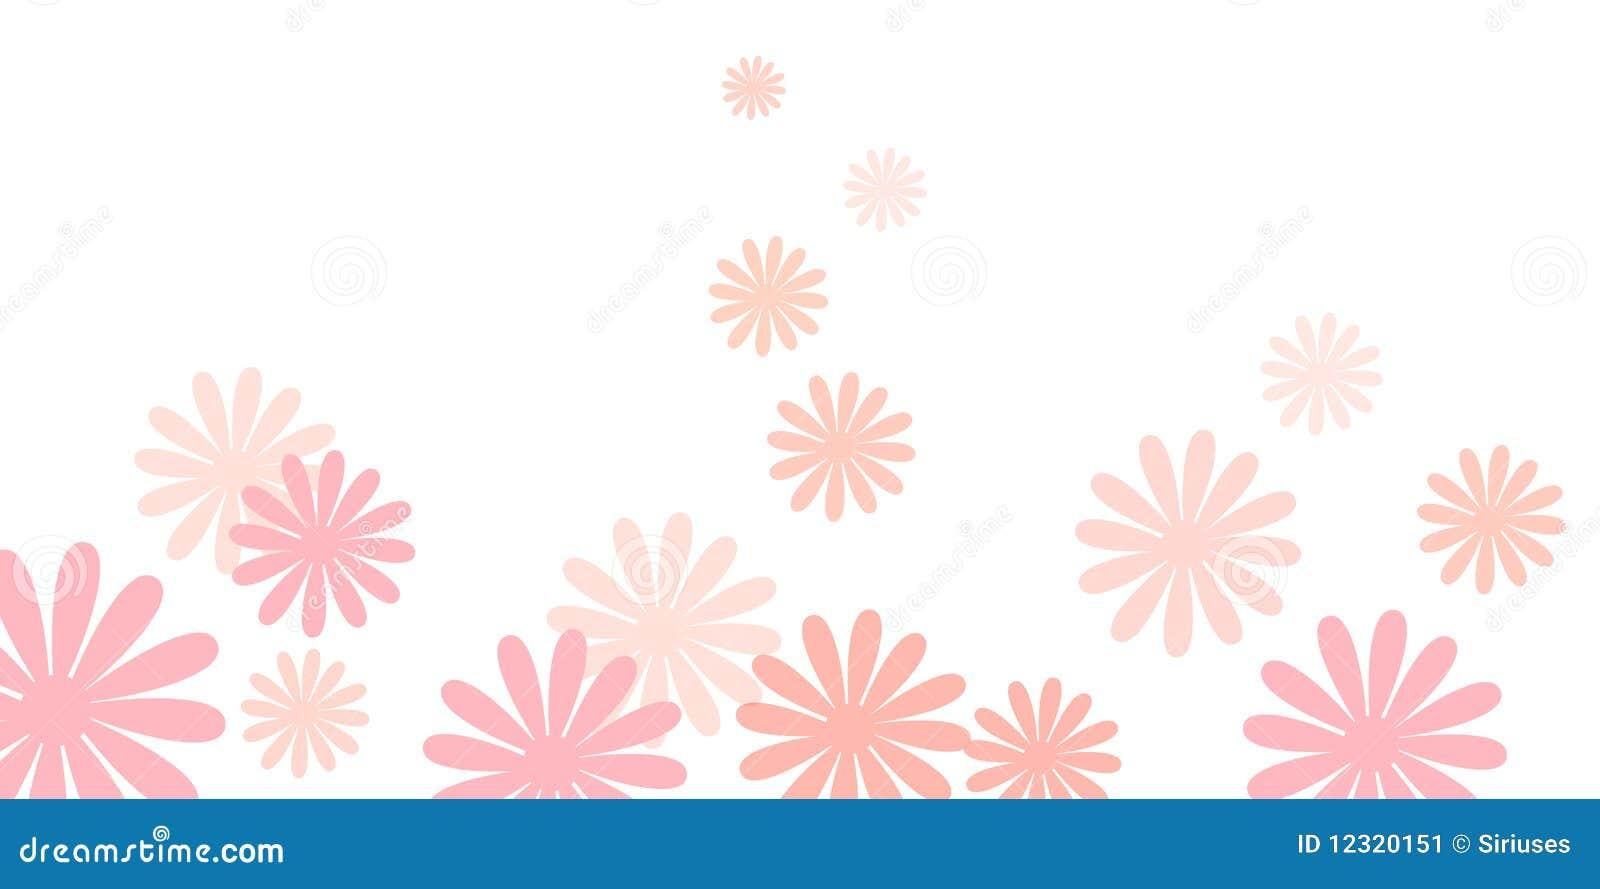 Pink Daisy Flowers Background Stock Image - Image: 12320151